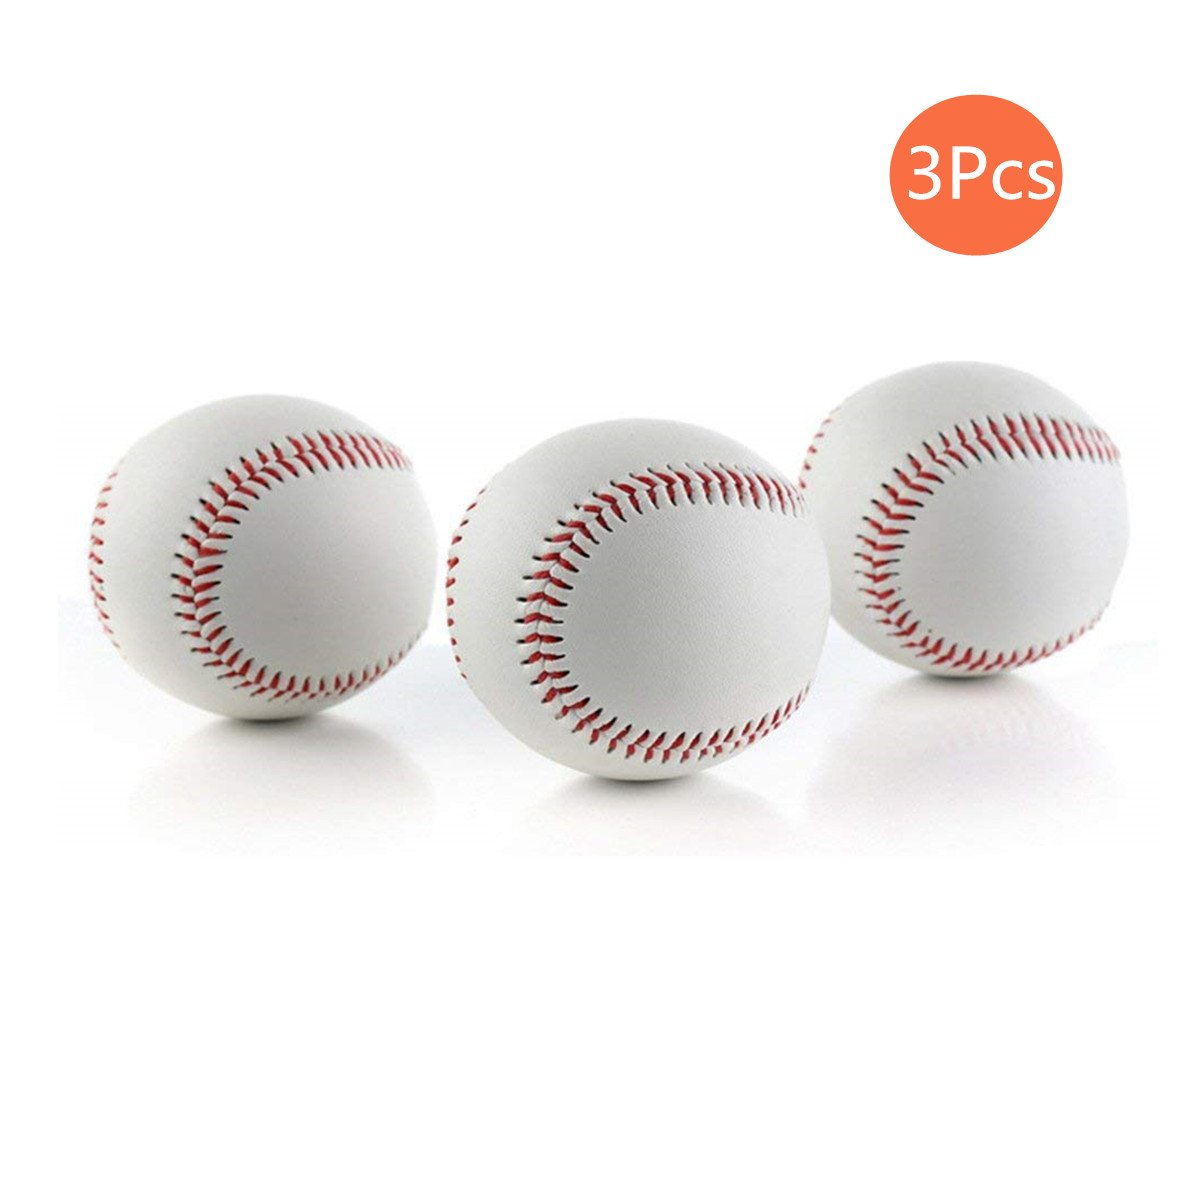 CZ-XING Hohe Qualität 22, 9cm Zoll Handgefertigt Basebälle PVC Obermaterial Gummi Innen Weiche und Harte Baseball Softball Bälle für Training Übung CZ-XING Hohe Qualität 22